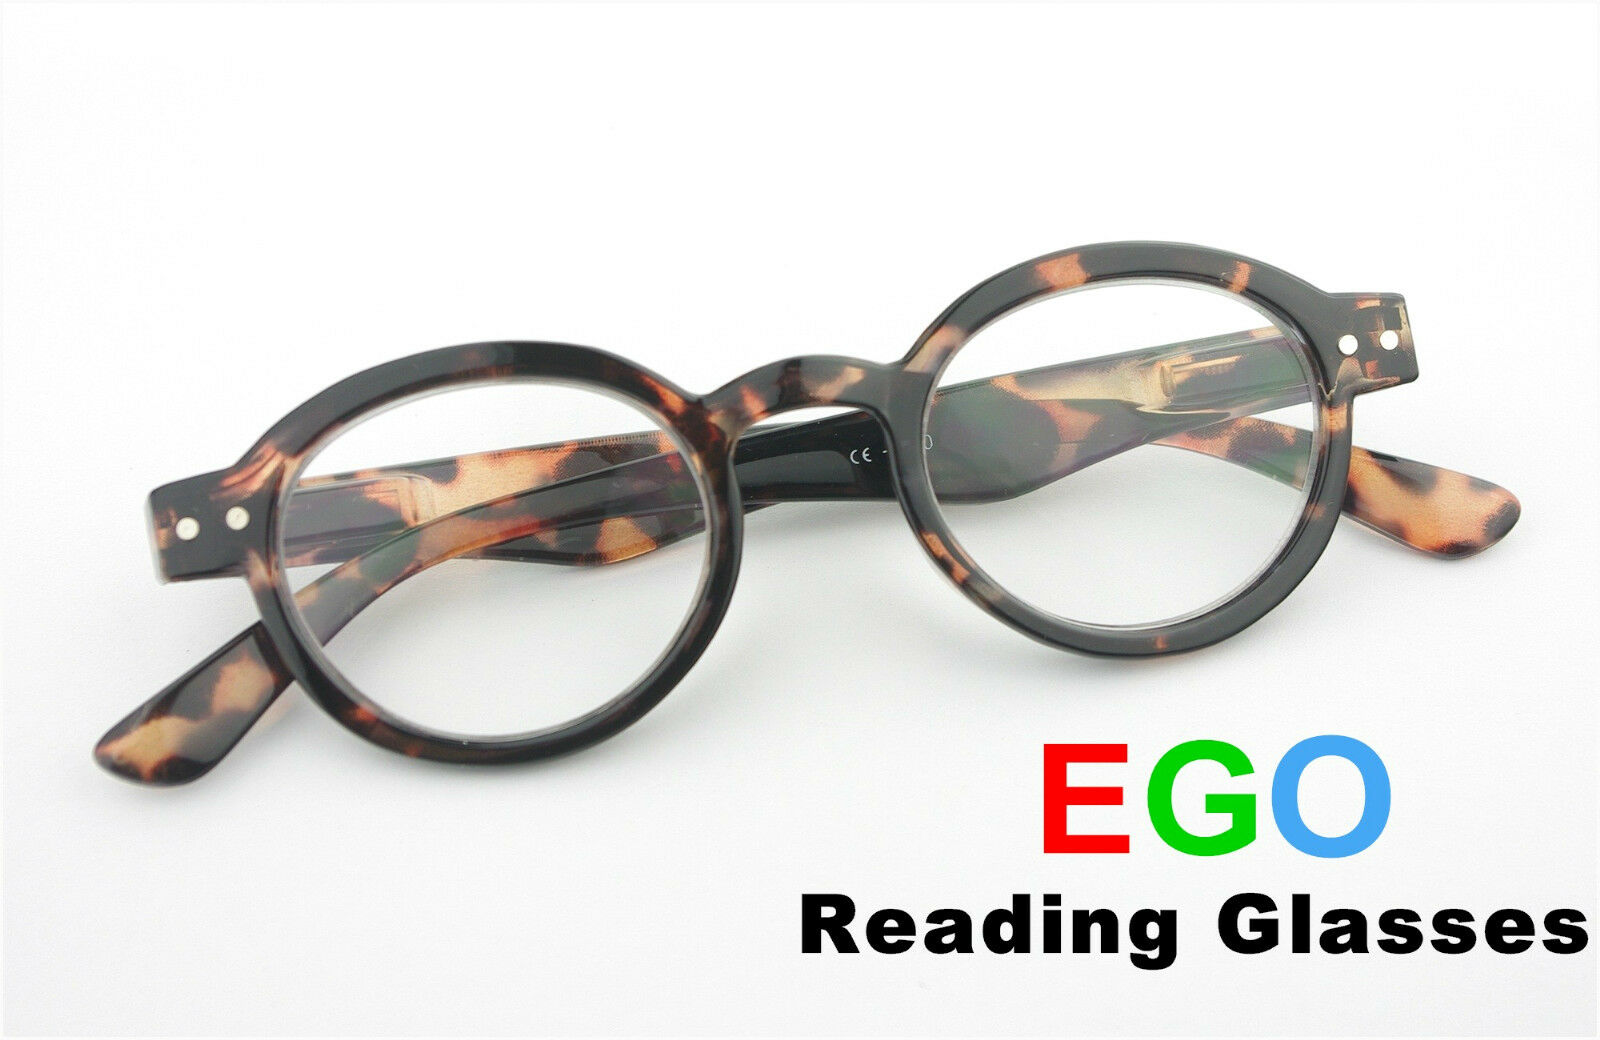 ego reading glasses tortoise metal dots